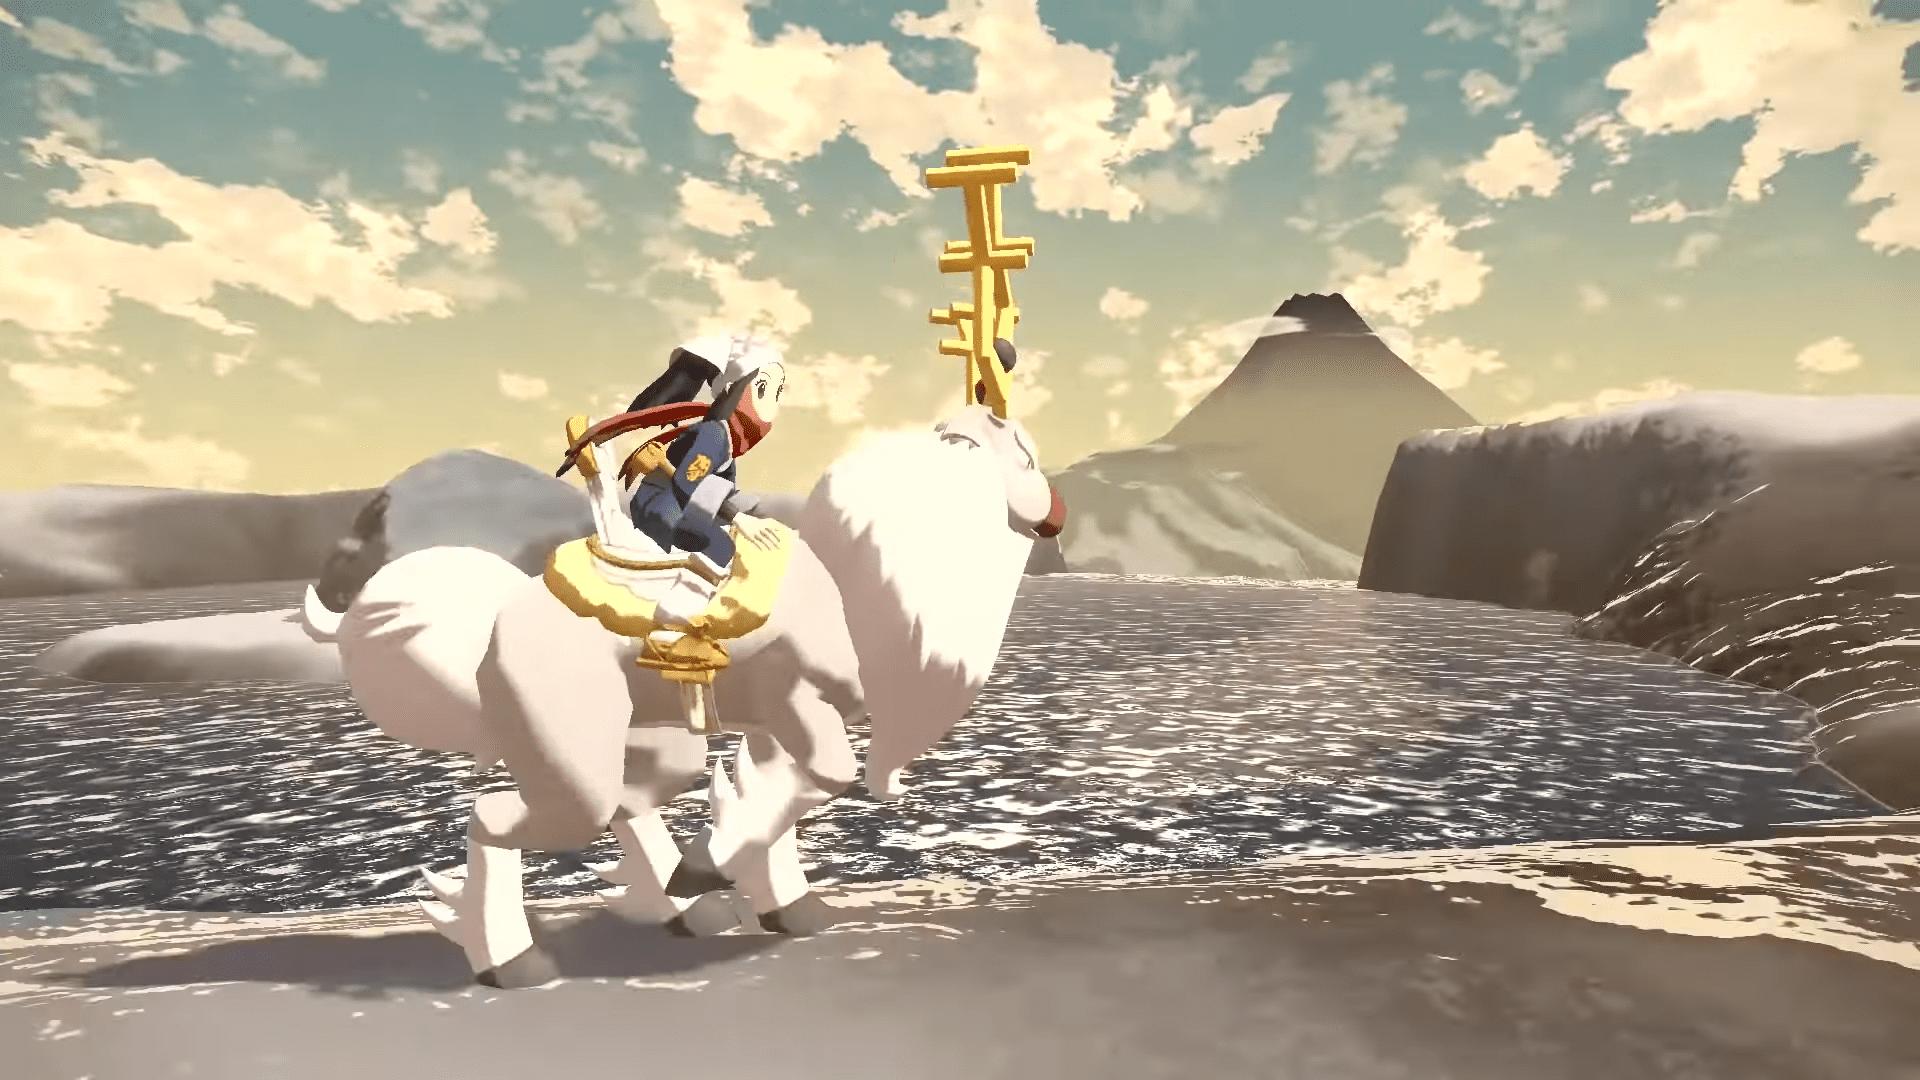 Pokemon Diamond Pearl Legends file sizes 2